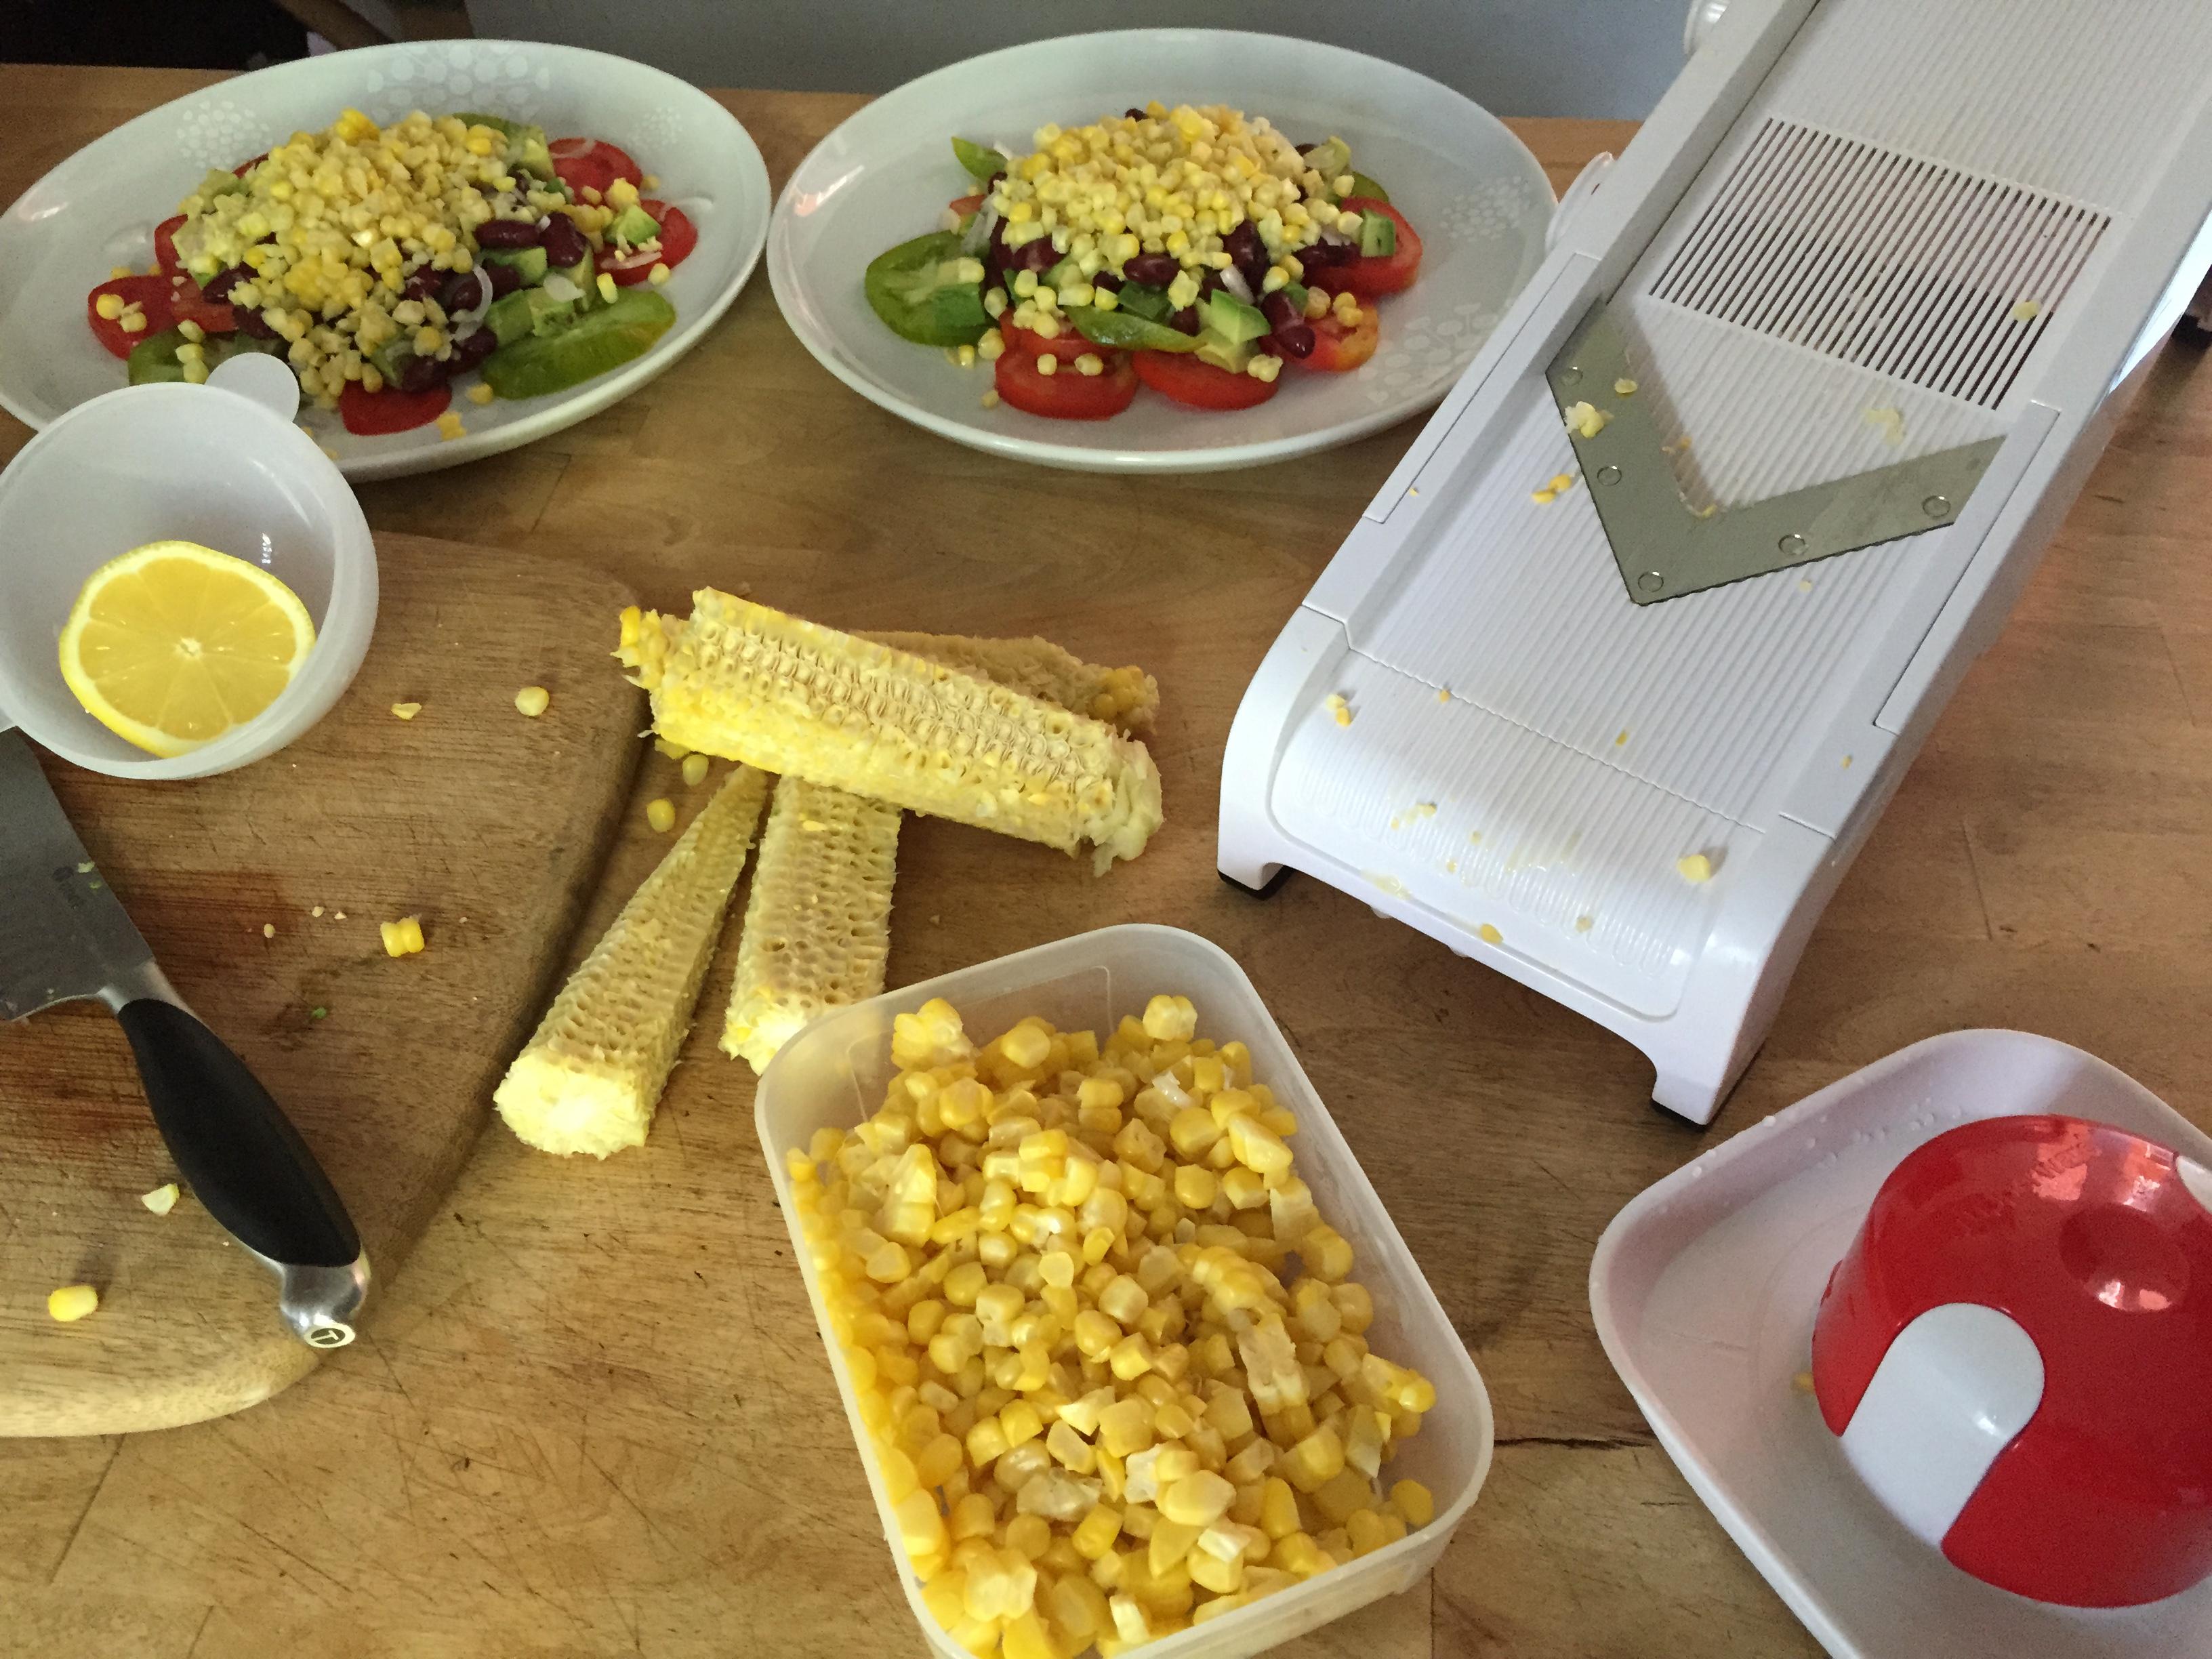 Whole kernel corn with the tupperware mandolin caroline schoofs ma vie en tupperware - Mandoline cuisine tupperware ...